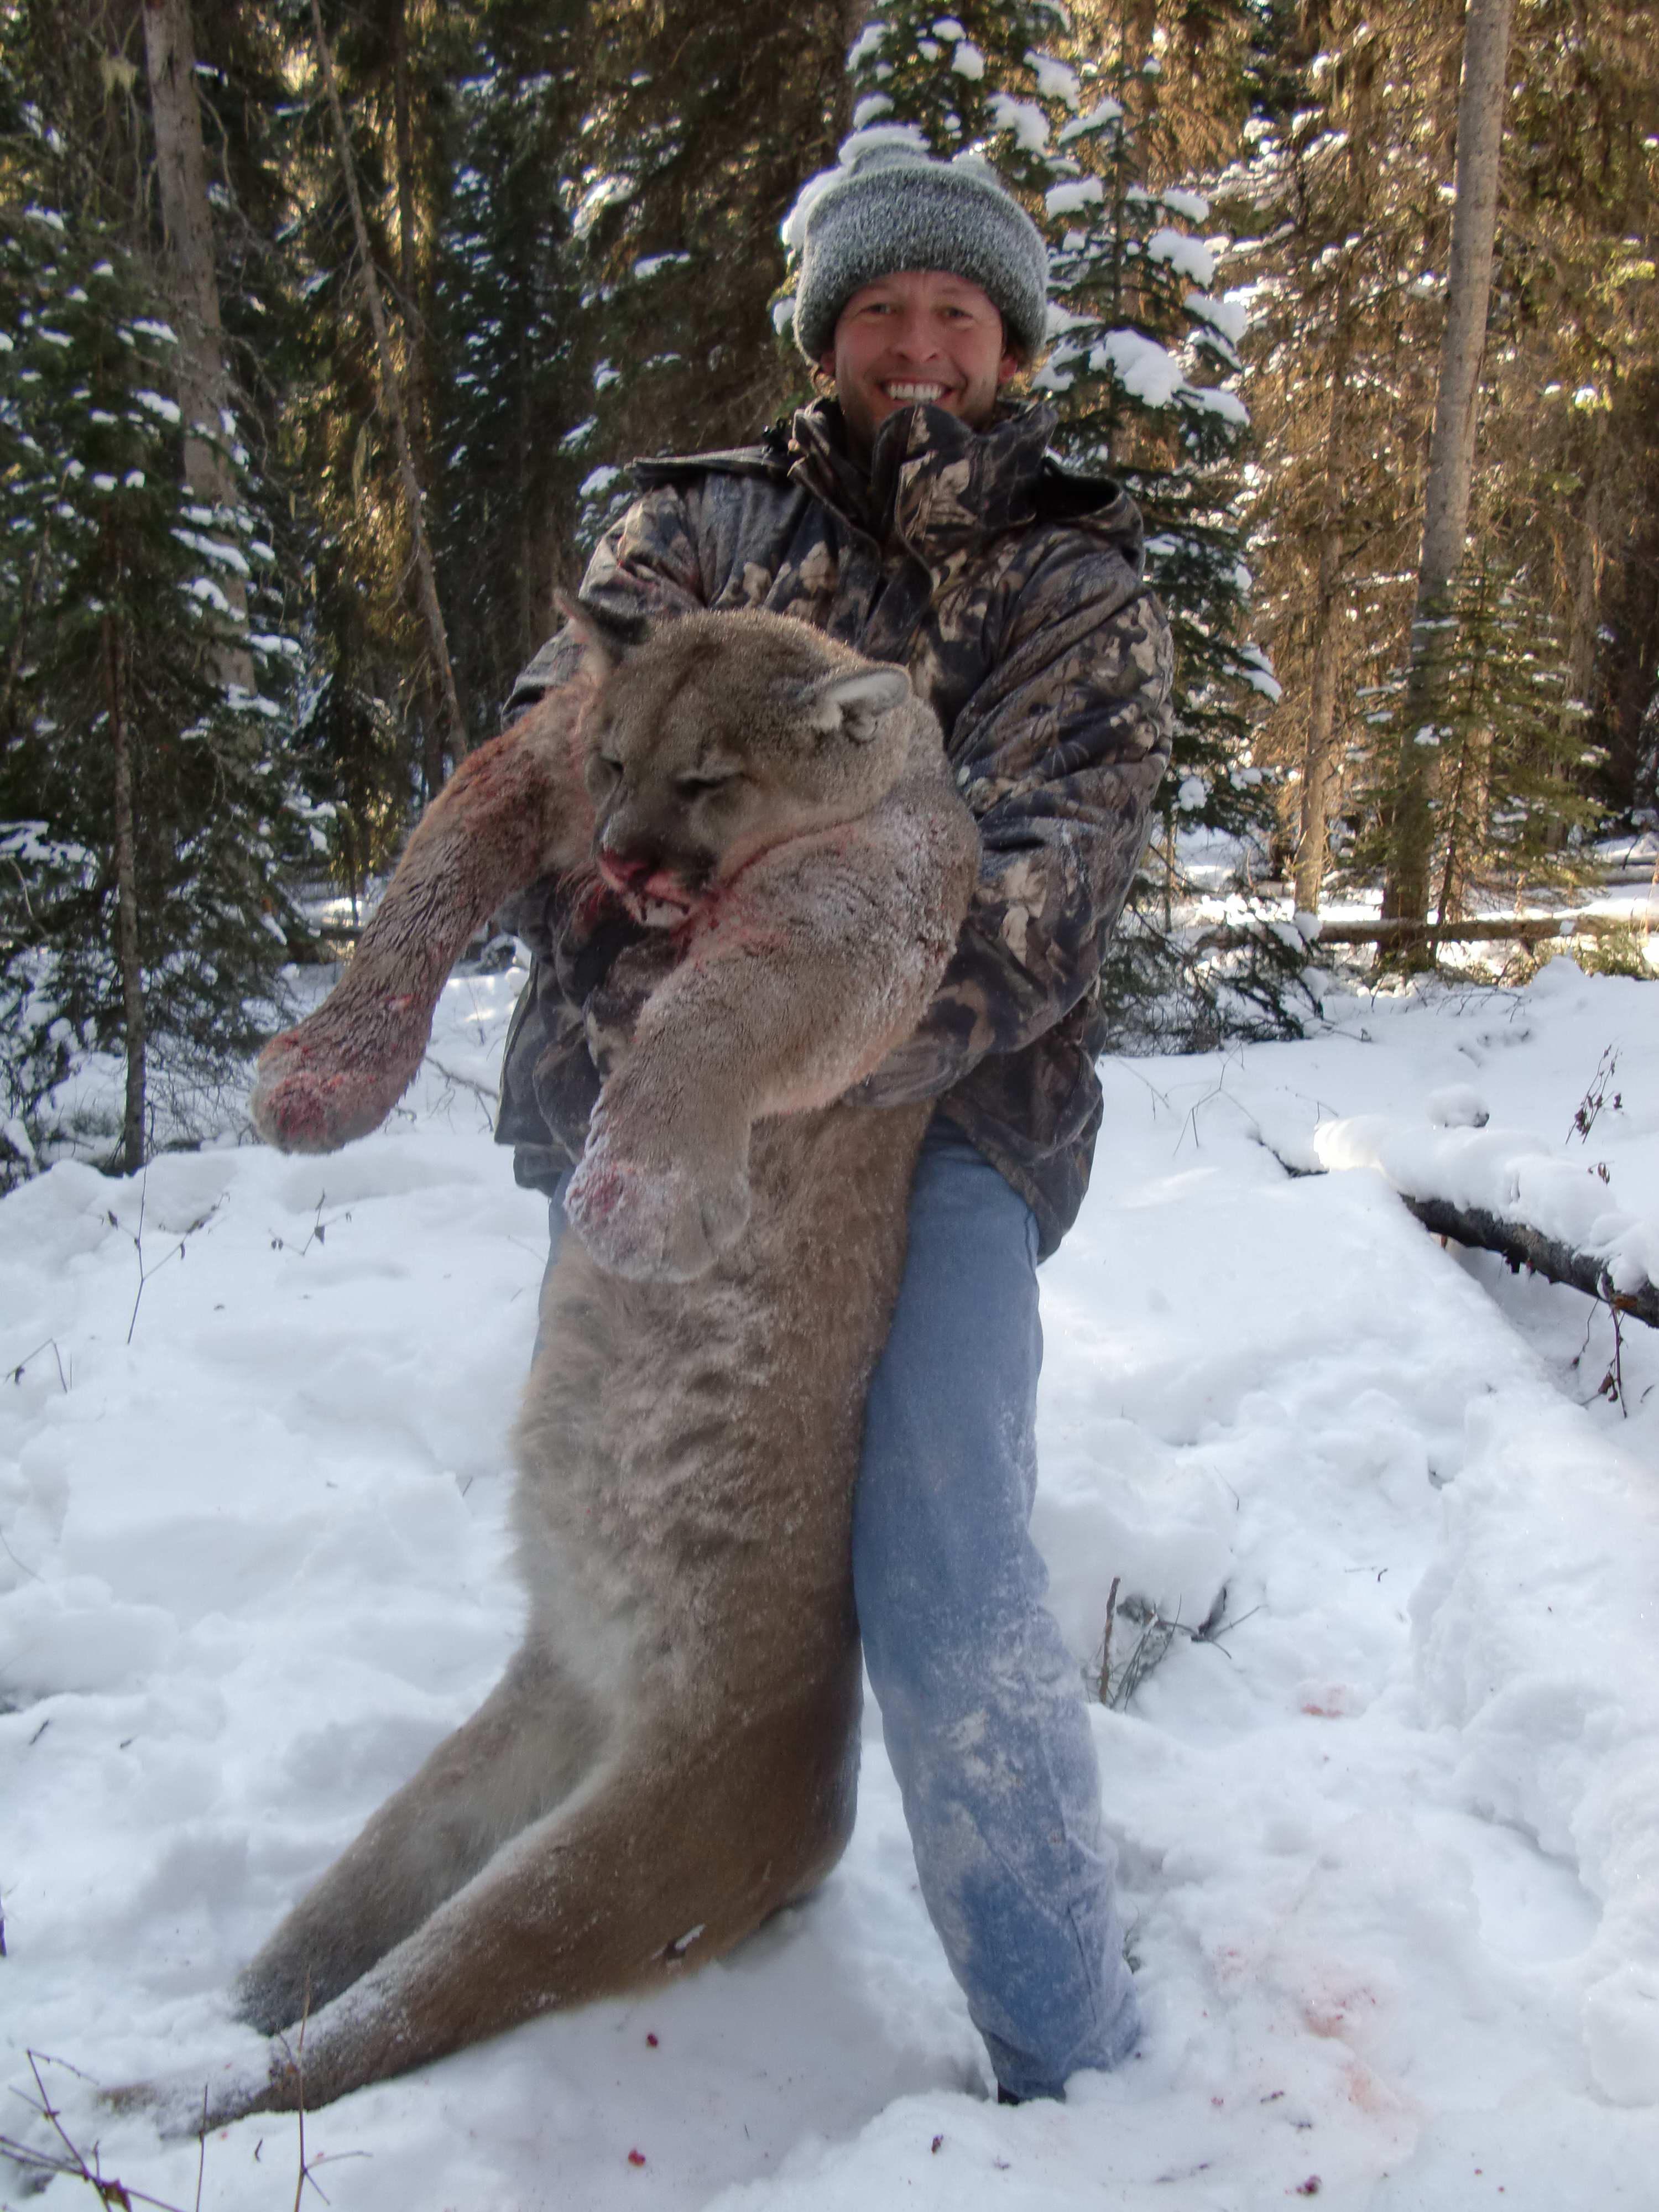 Jim Miller 12/10/09 lion